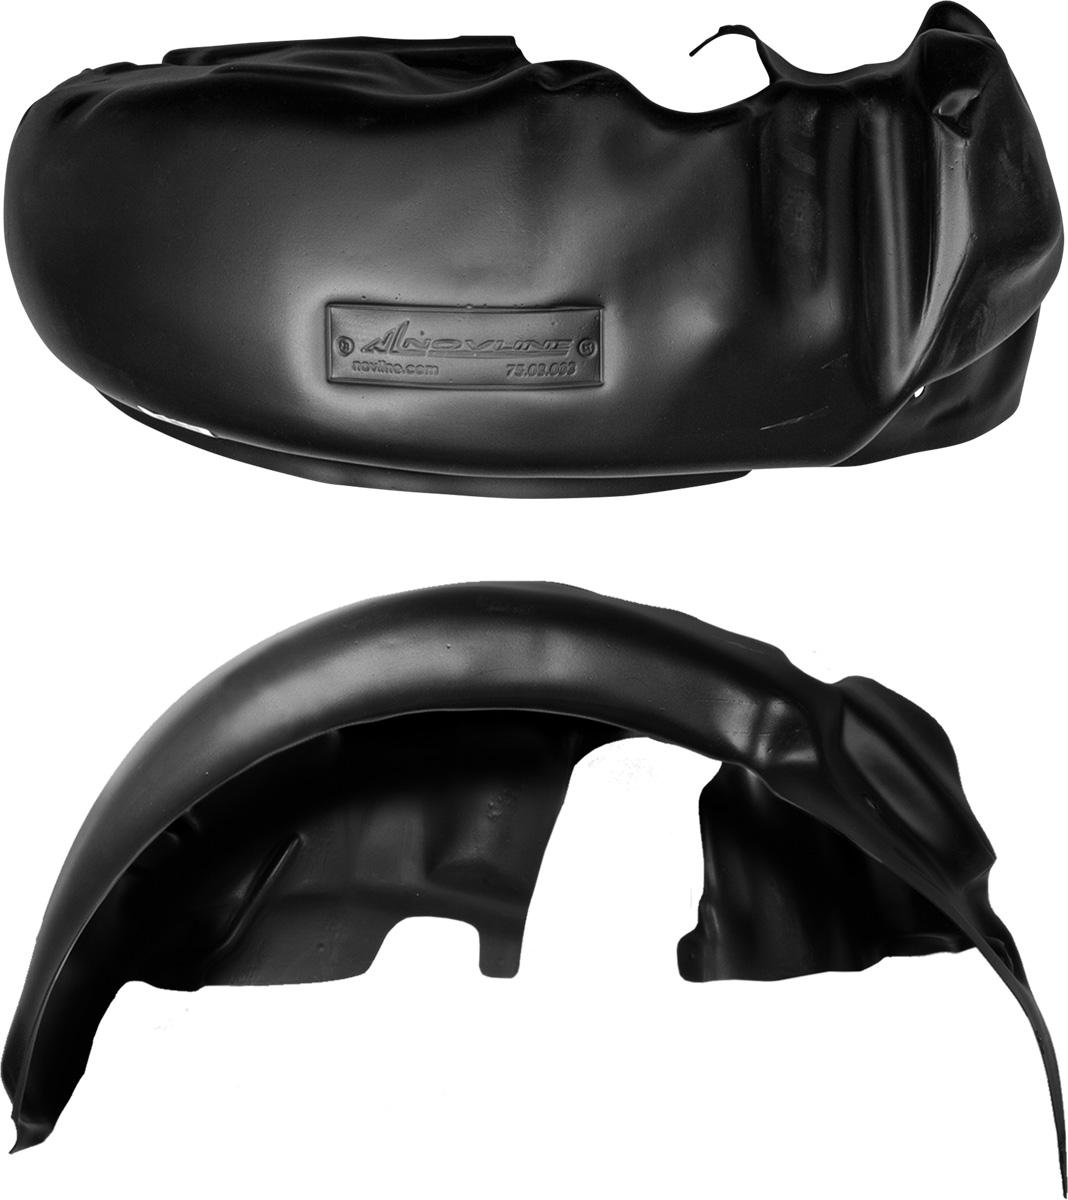 Подкрылок Novline-Autofamily, для Ford Transit 2006-2014, передний правый коврики в салон автомобиля novline autofamily для ford transit мкпп 2006 2014 2 шт